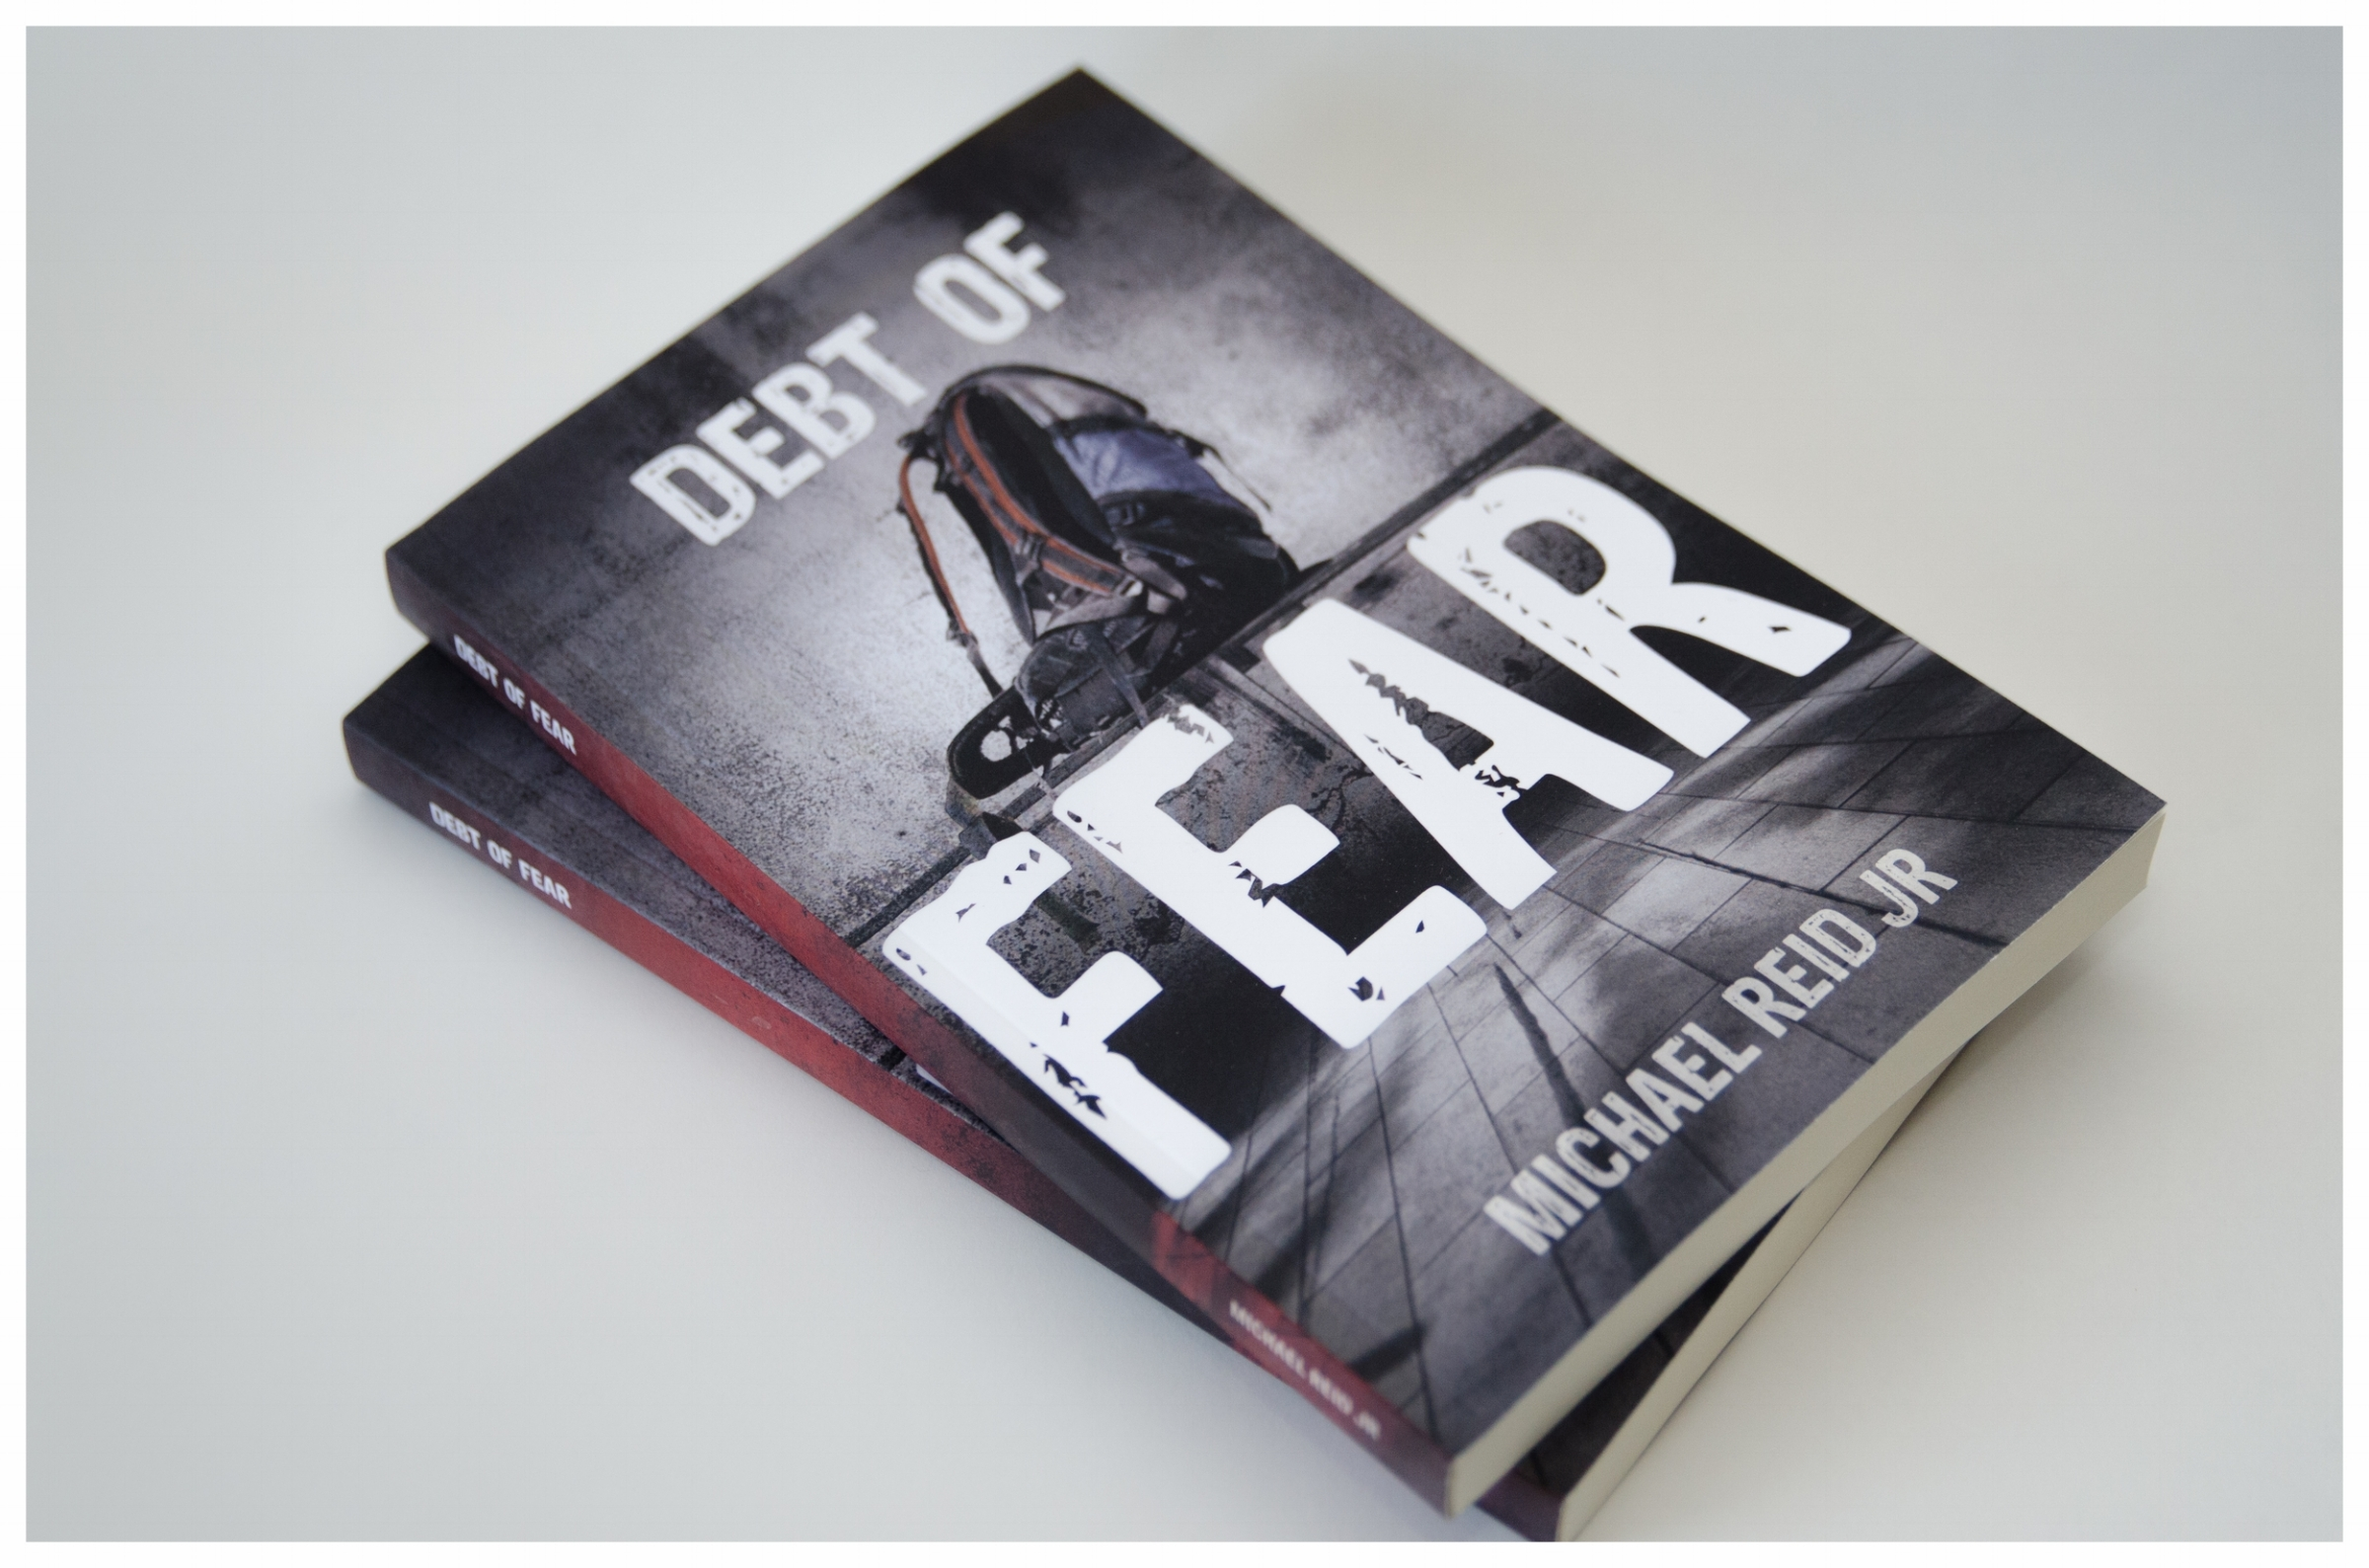 Debt of Fear promo 2.jpg